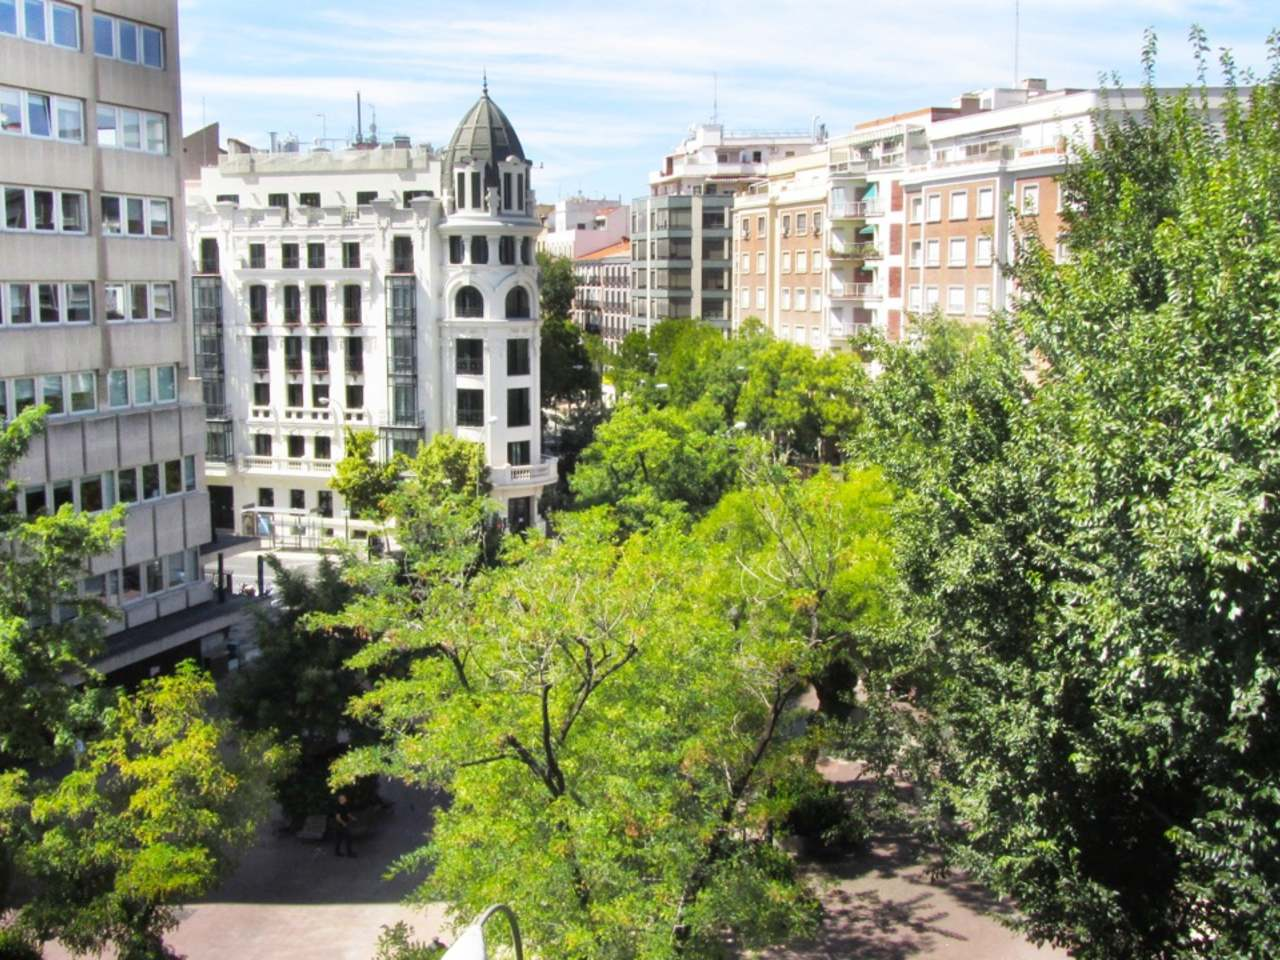 Appartement de 130m a vendre trafalgar madrid - Appartement de ville anton bazaliiskii ...